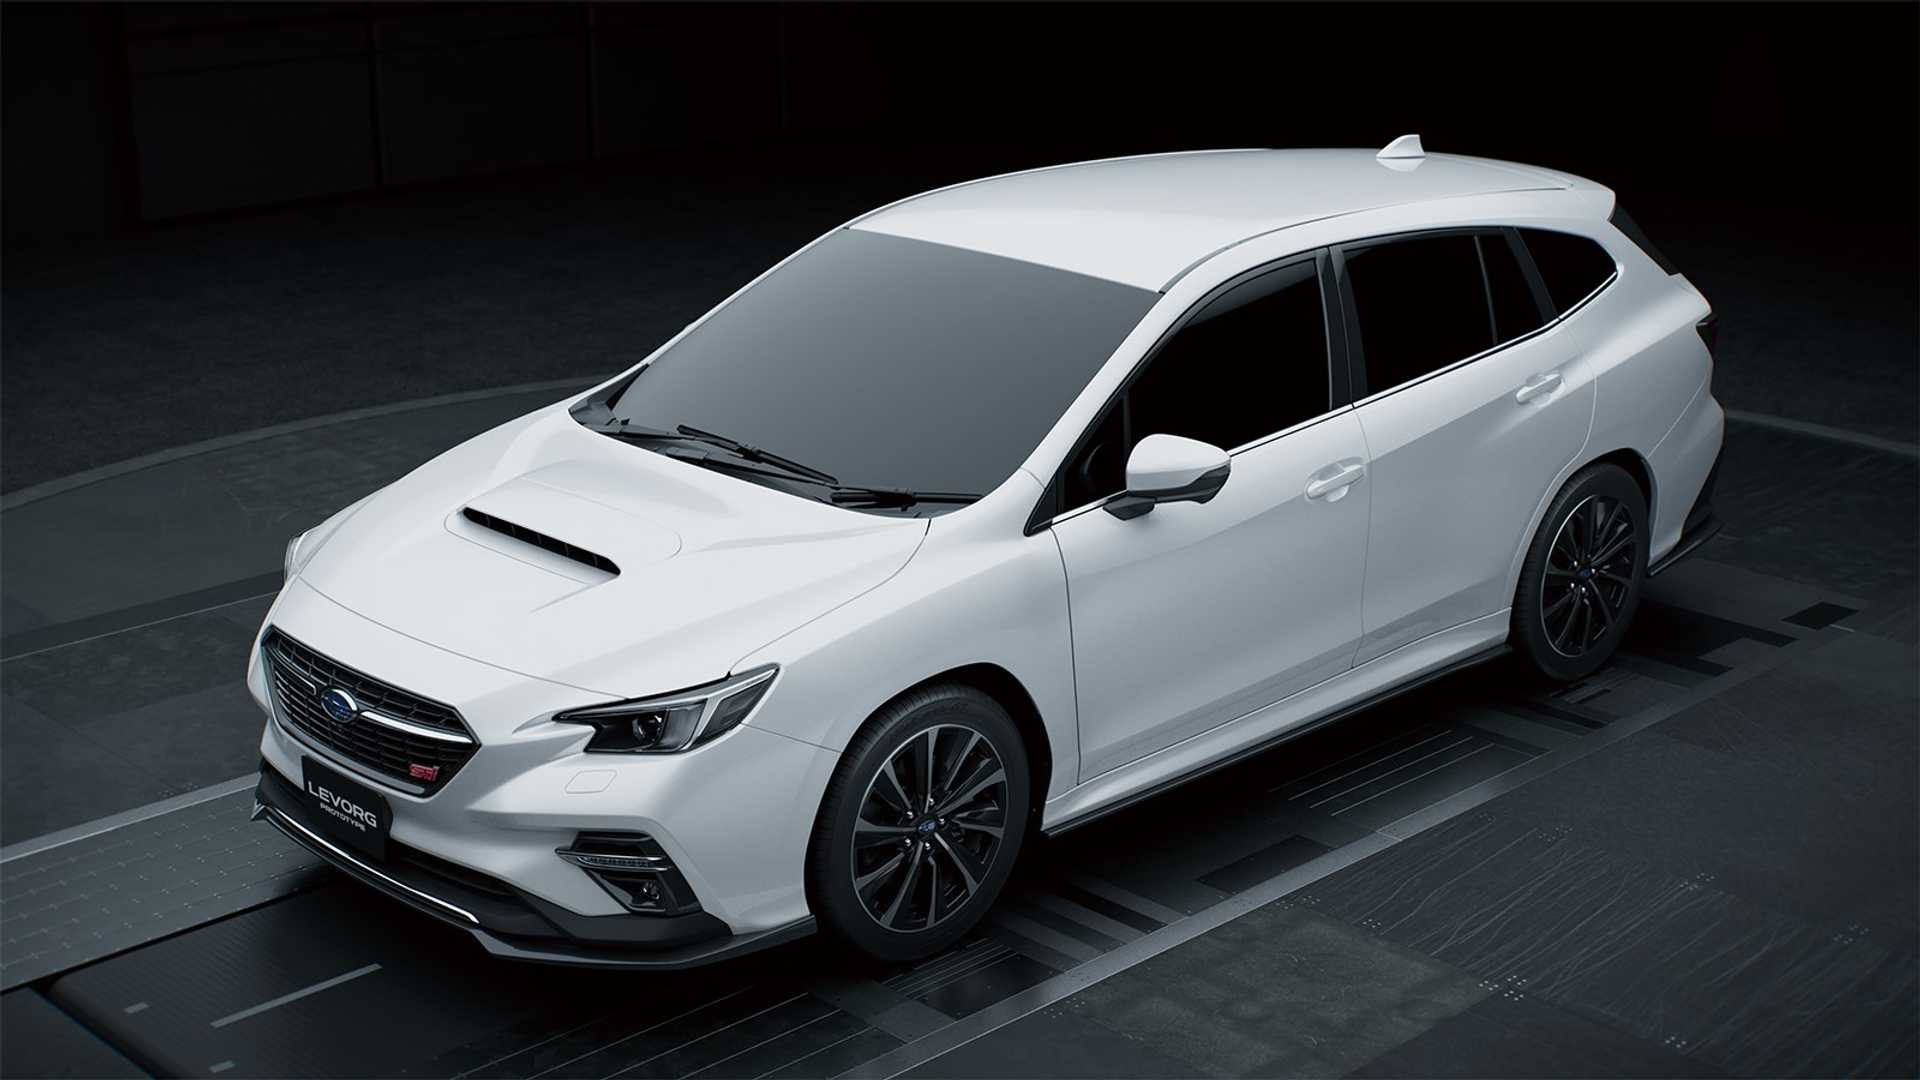 Subaru-Levorg-STI-Sport-Prototype-5